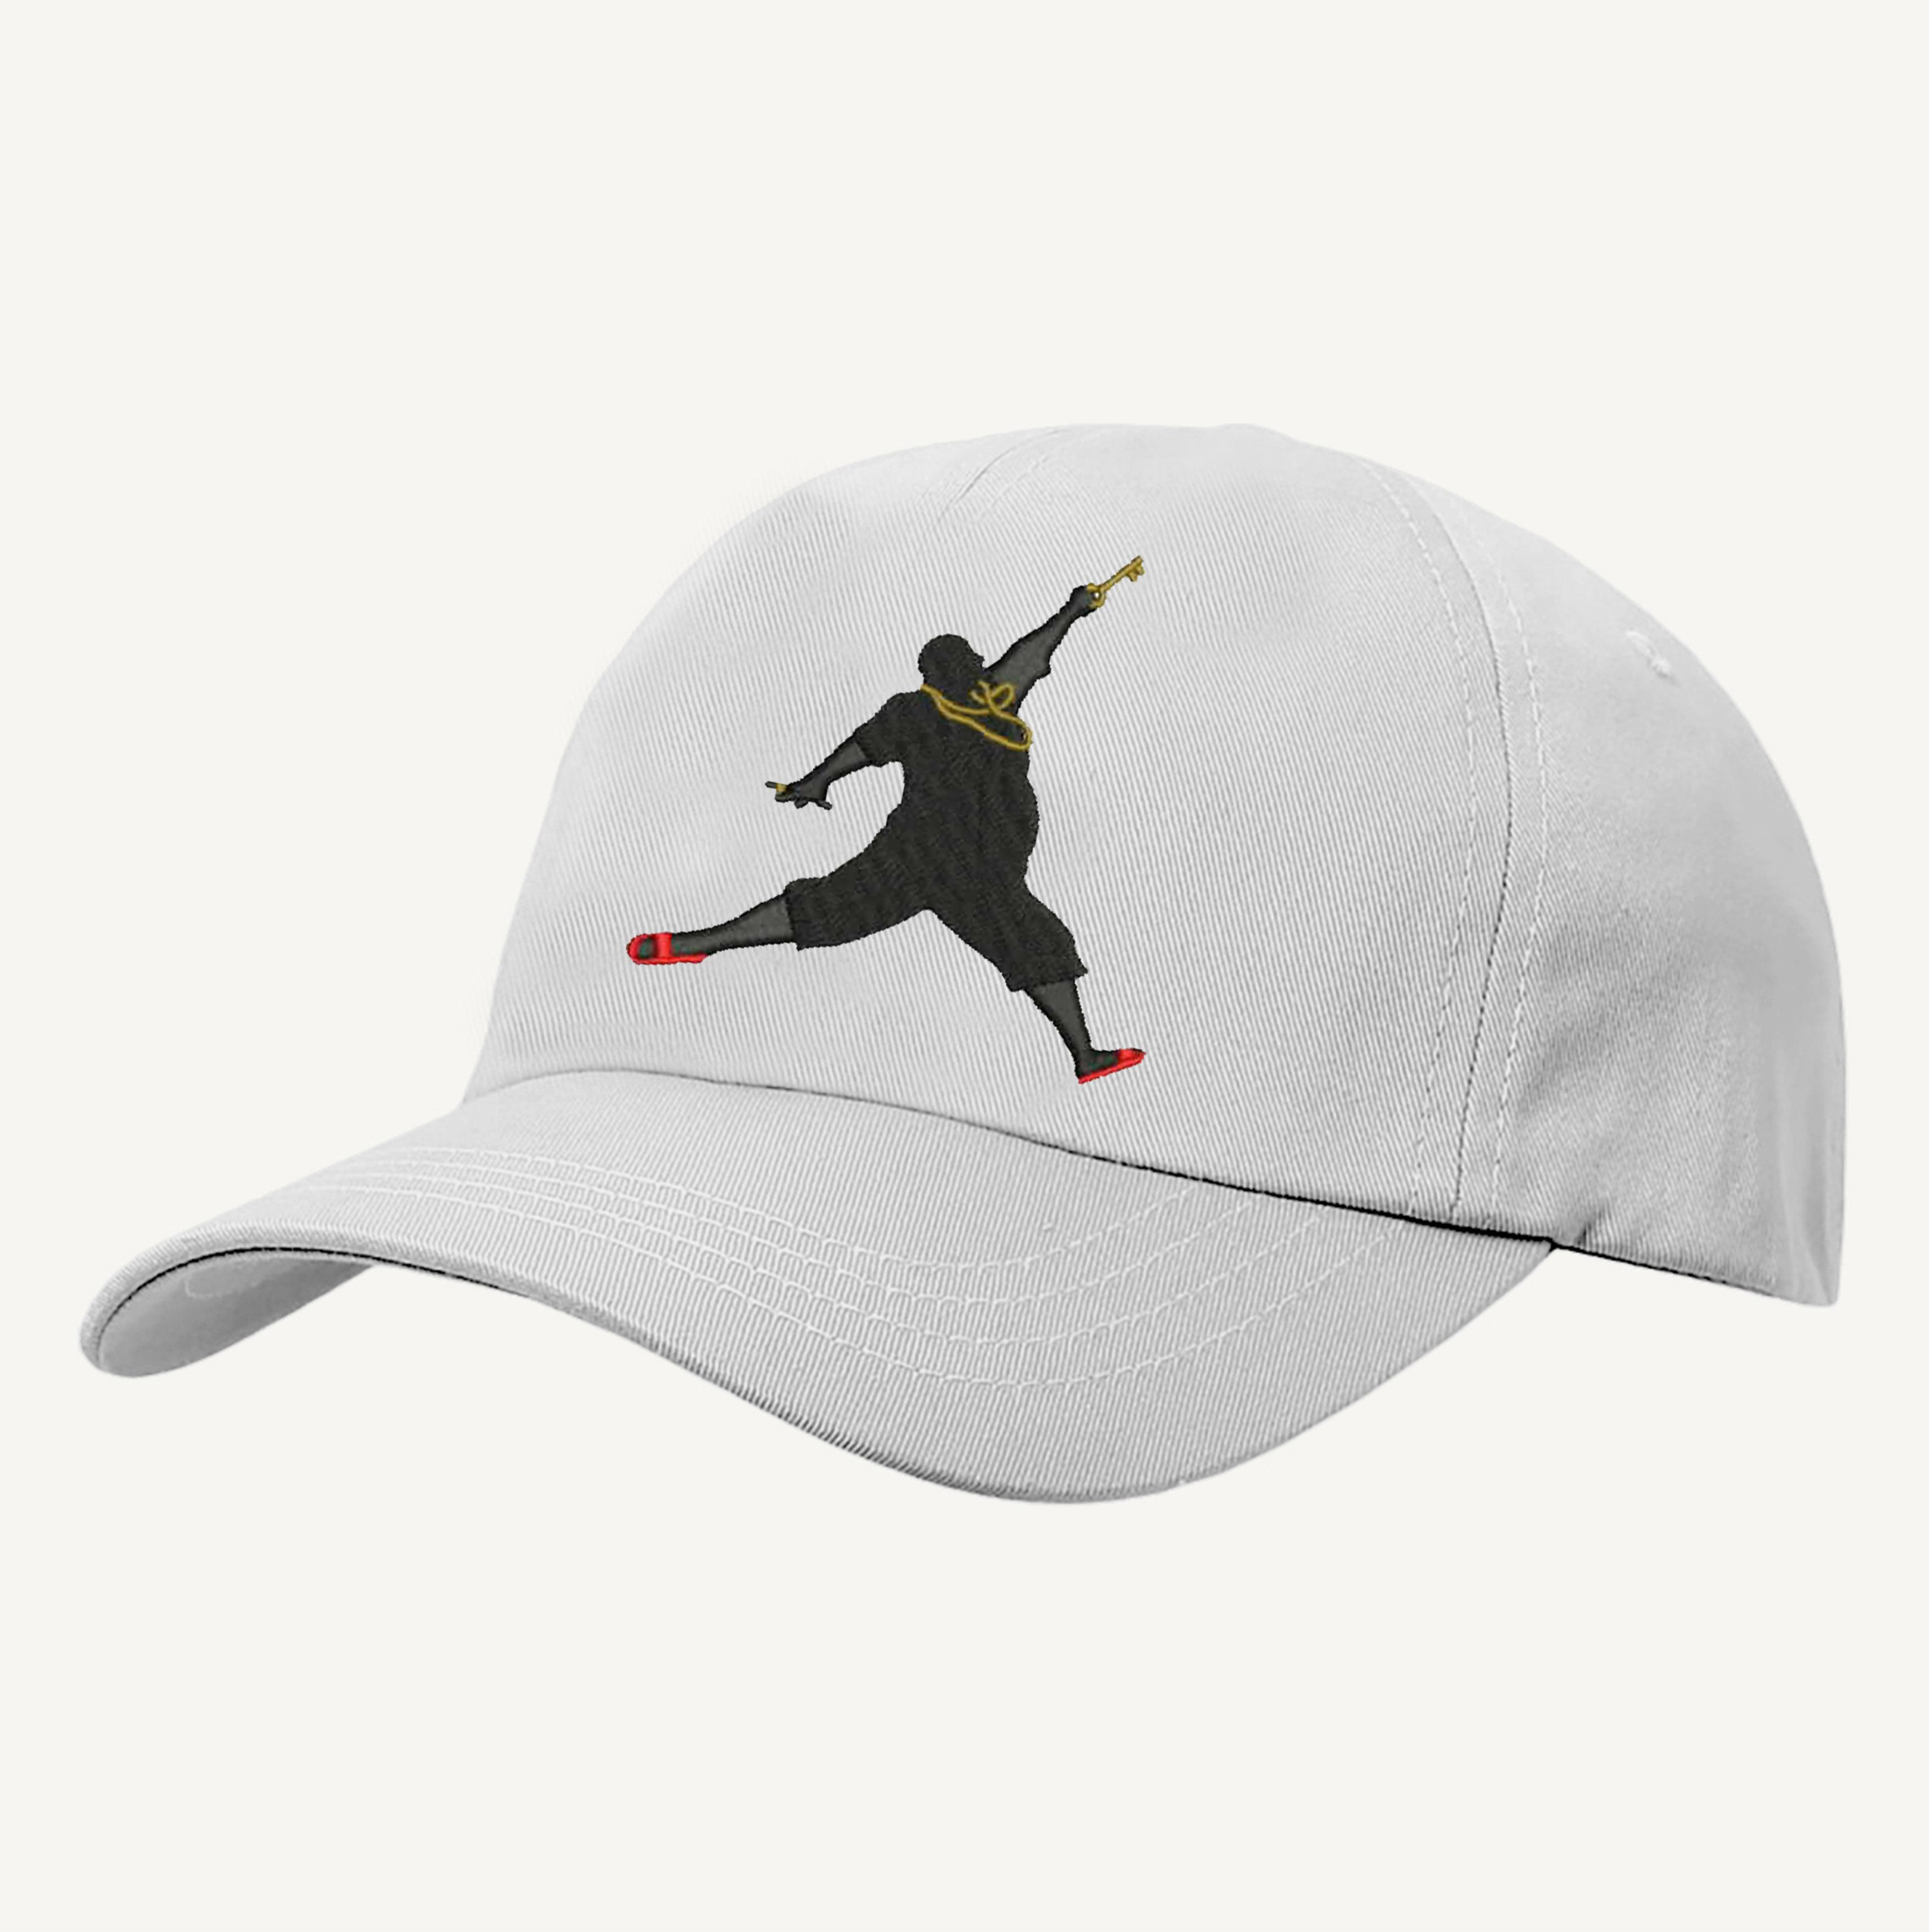 0f3d083b0fb get jordan cappello snapback uomo jumpman snapback white white 6fa63 28a9c   promo code dj khaled baseball cap urban hip hop music 68661 4903a